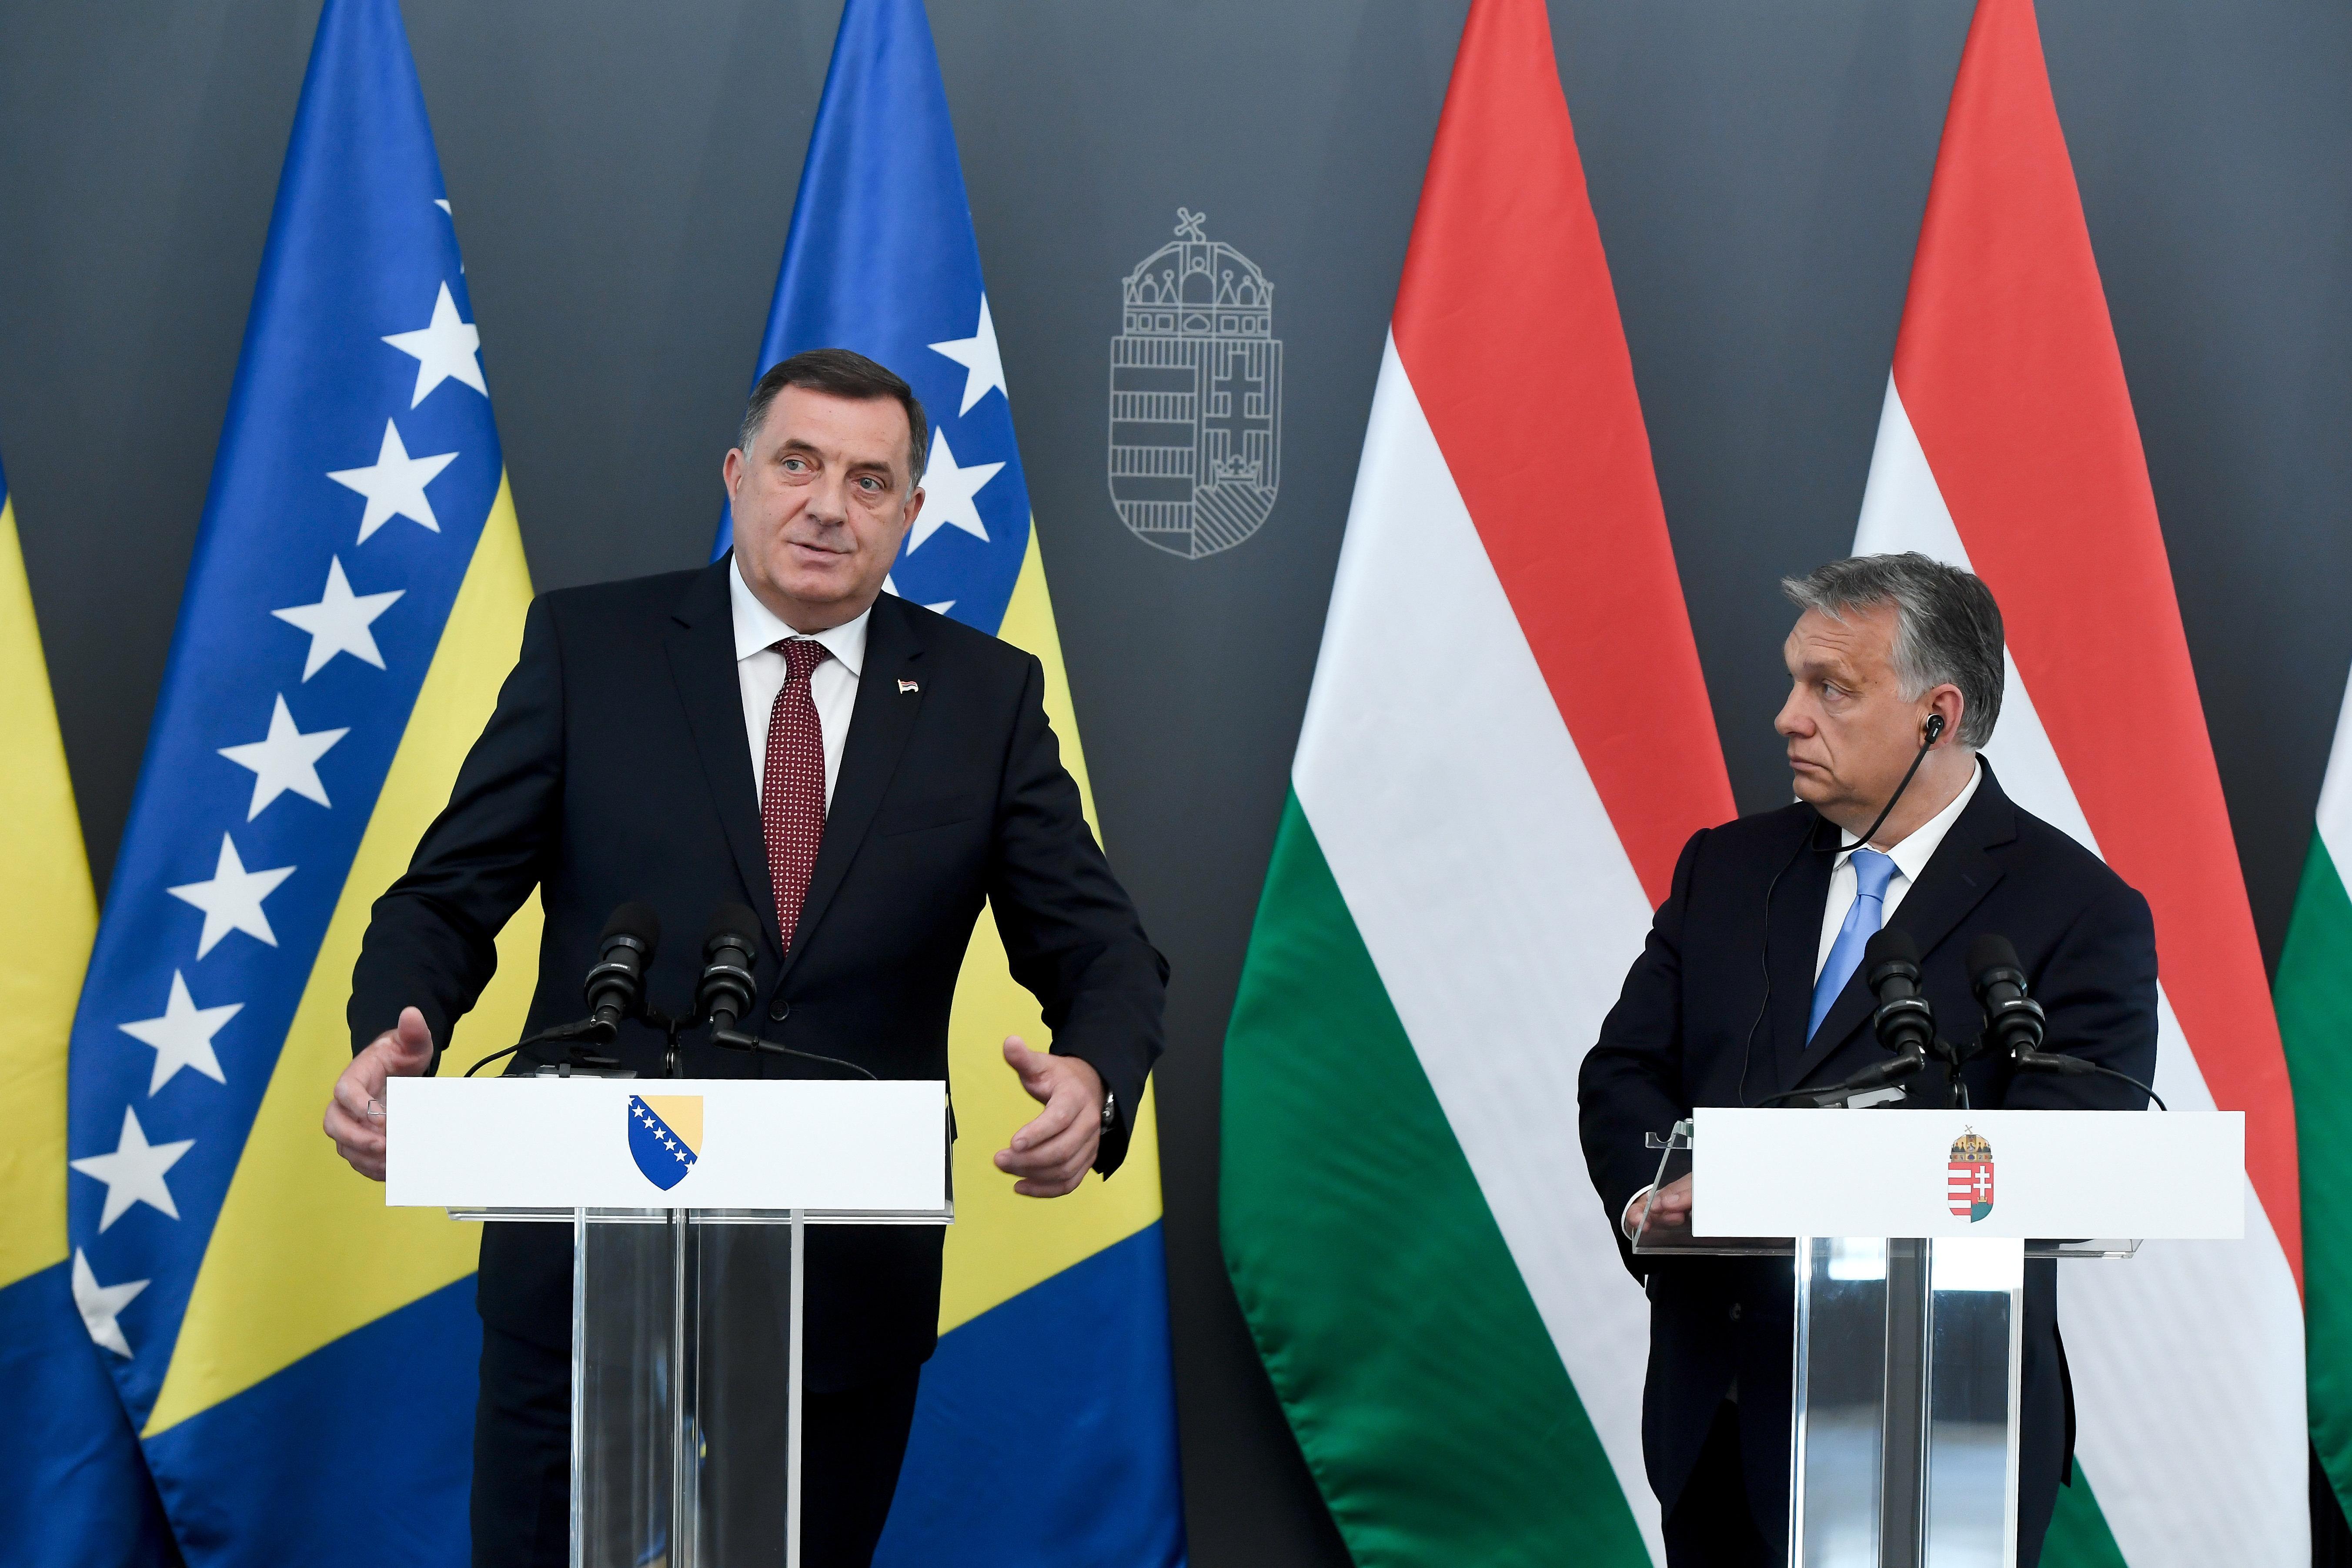 Hungary, Republika Srpska agree to intensify ties